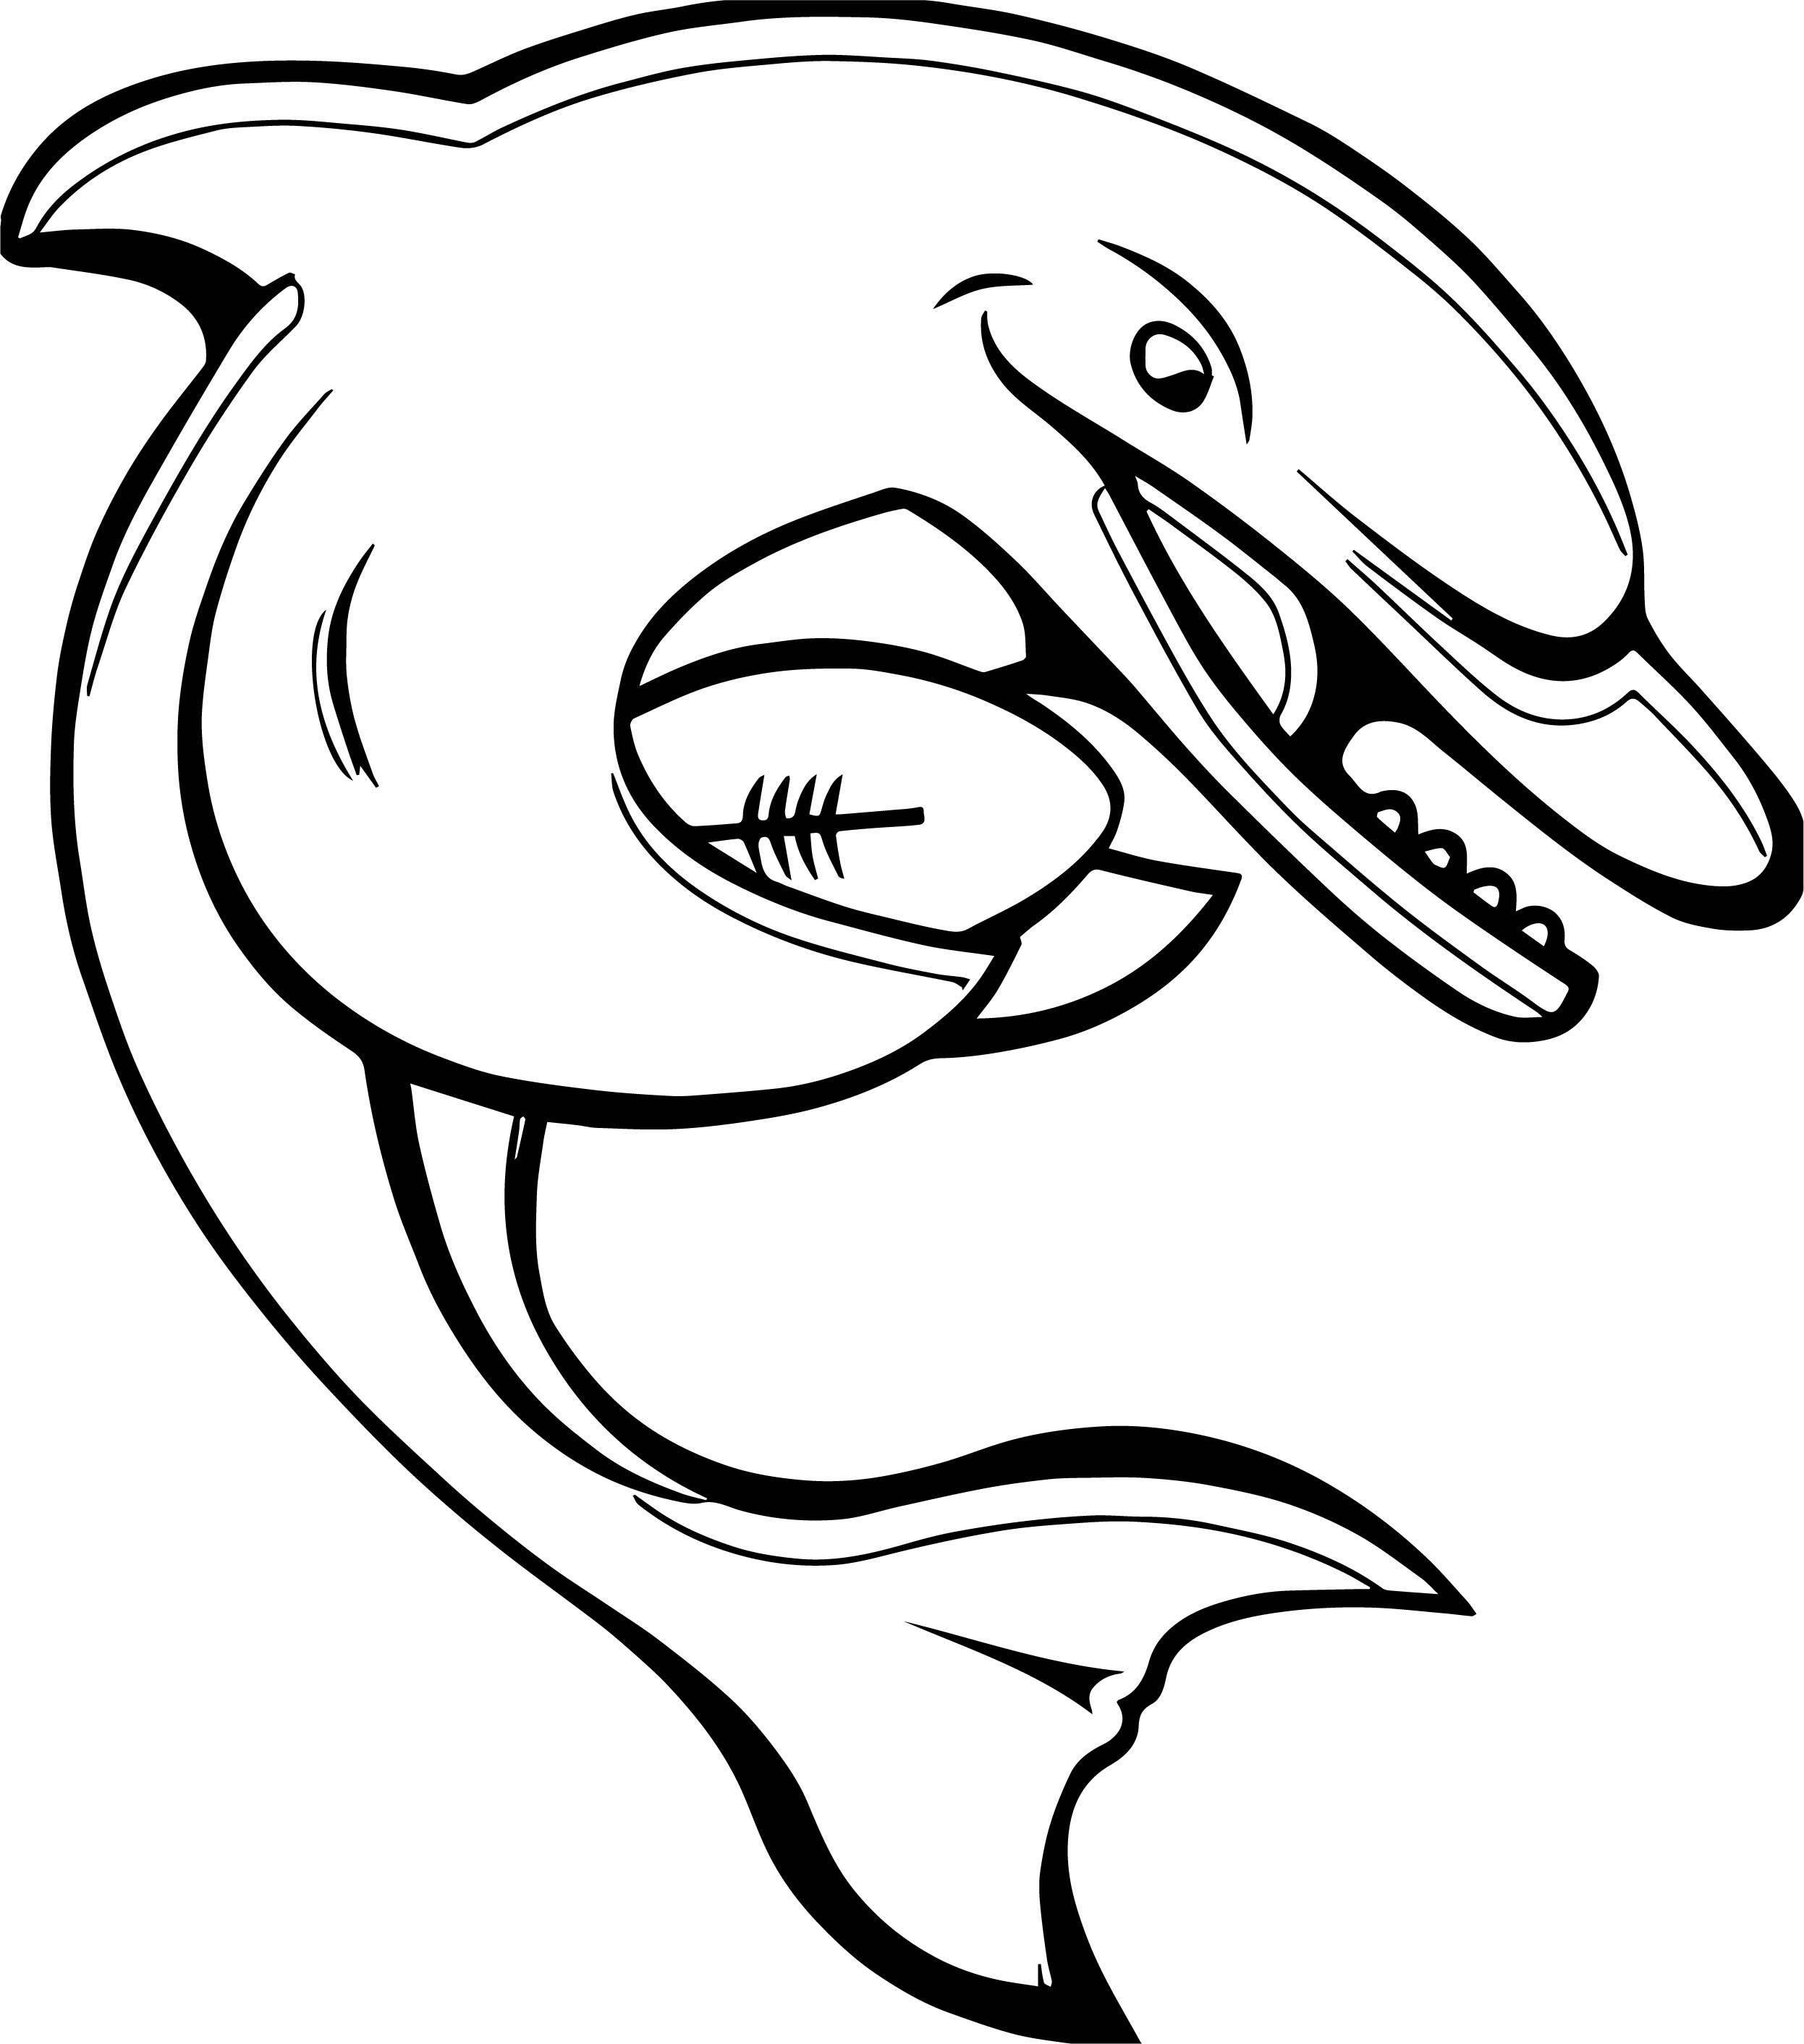 Dolphin American Footballl Baseball Coloring Page